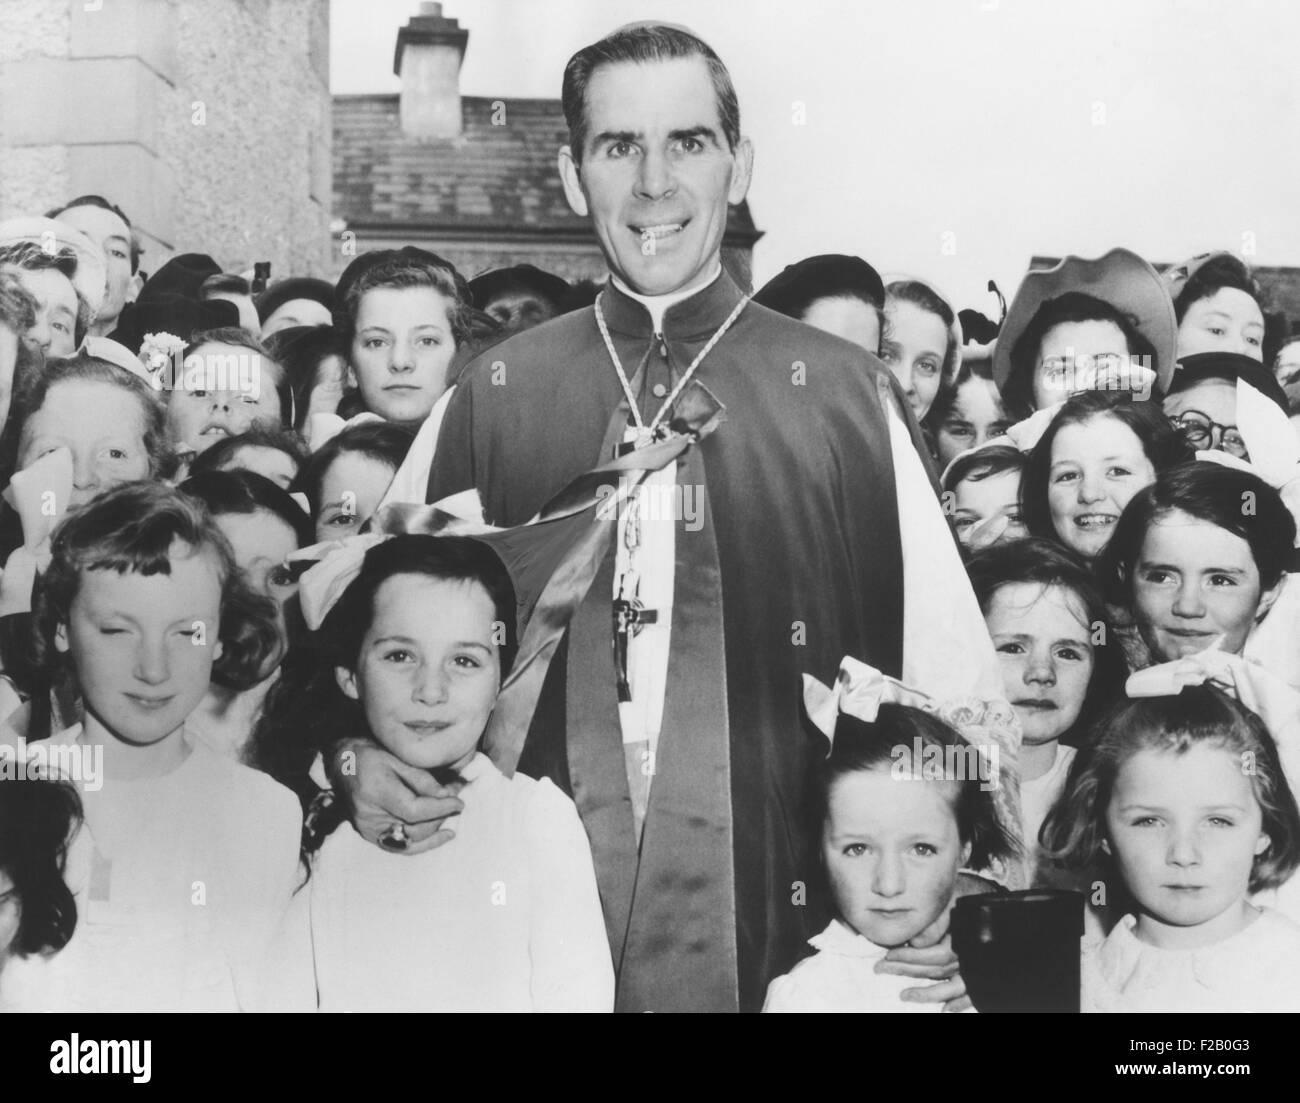 Bishop Fulton Sheen with Irish children in Choghan County, Roscommon, Ireland. April 22, 1952. Bishop Sheen's - Stock Image